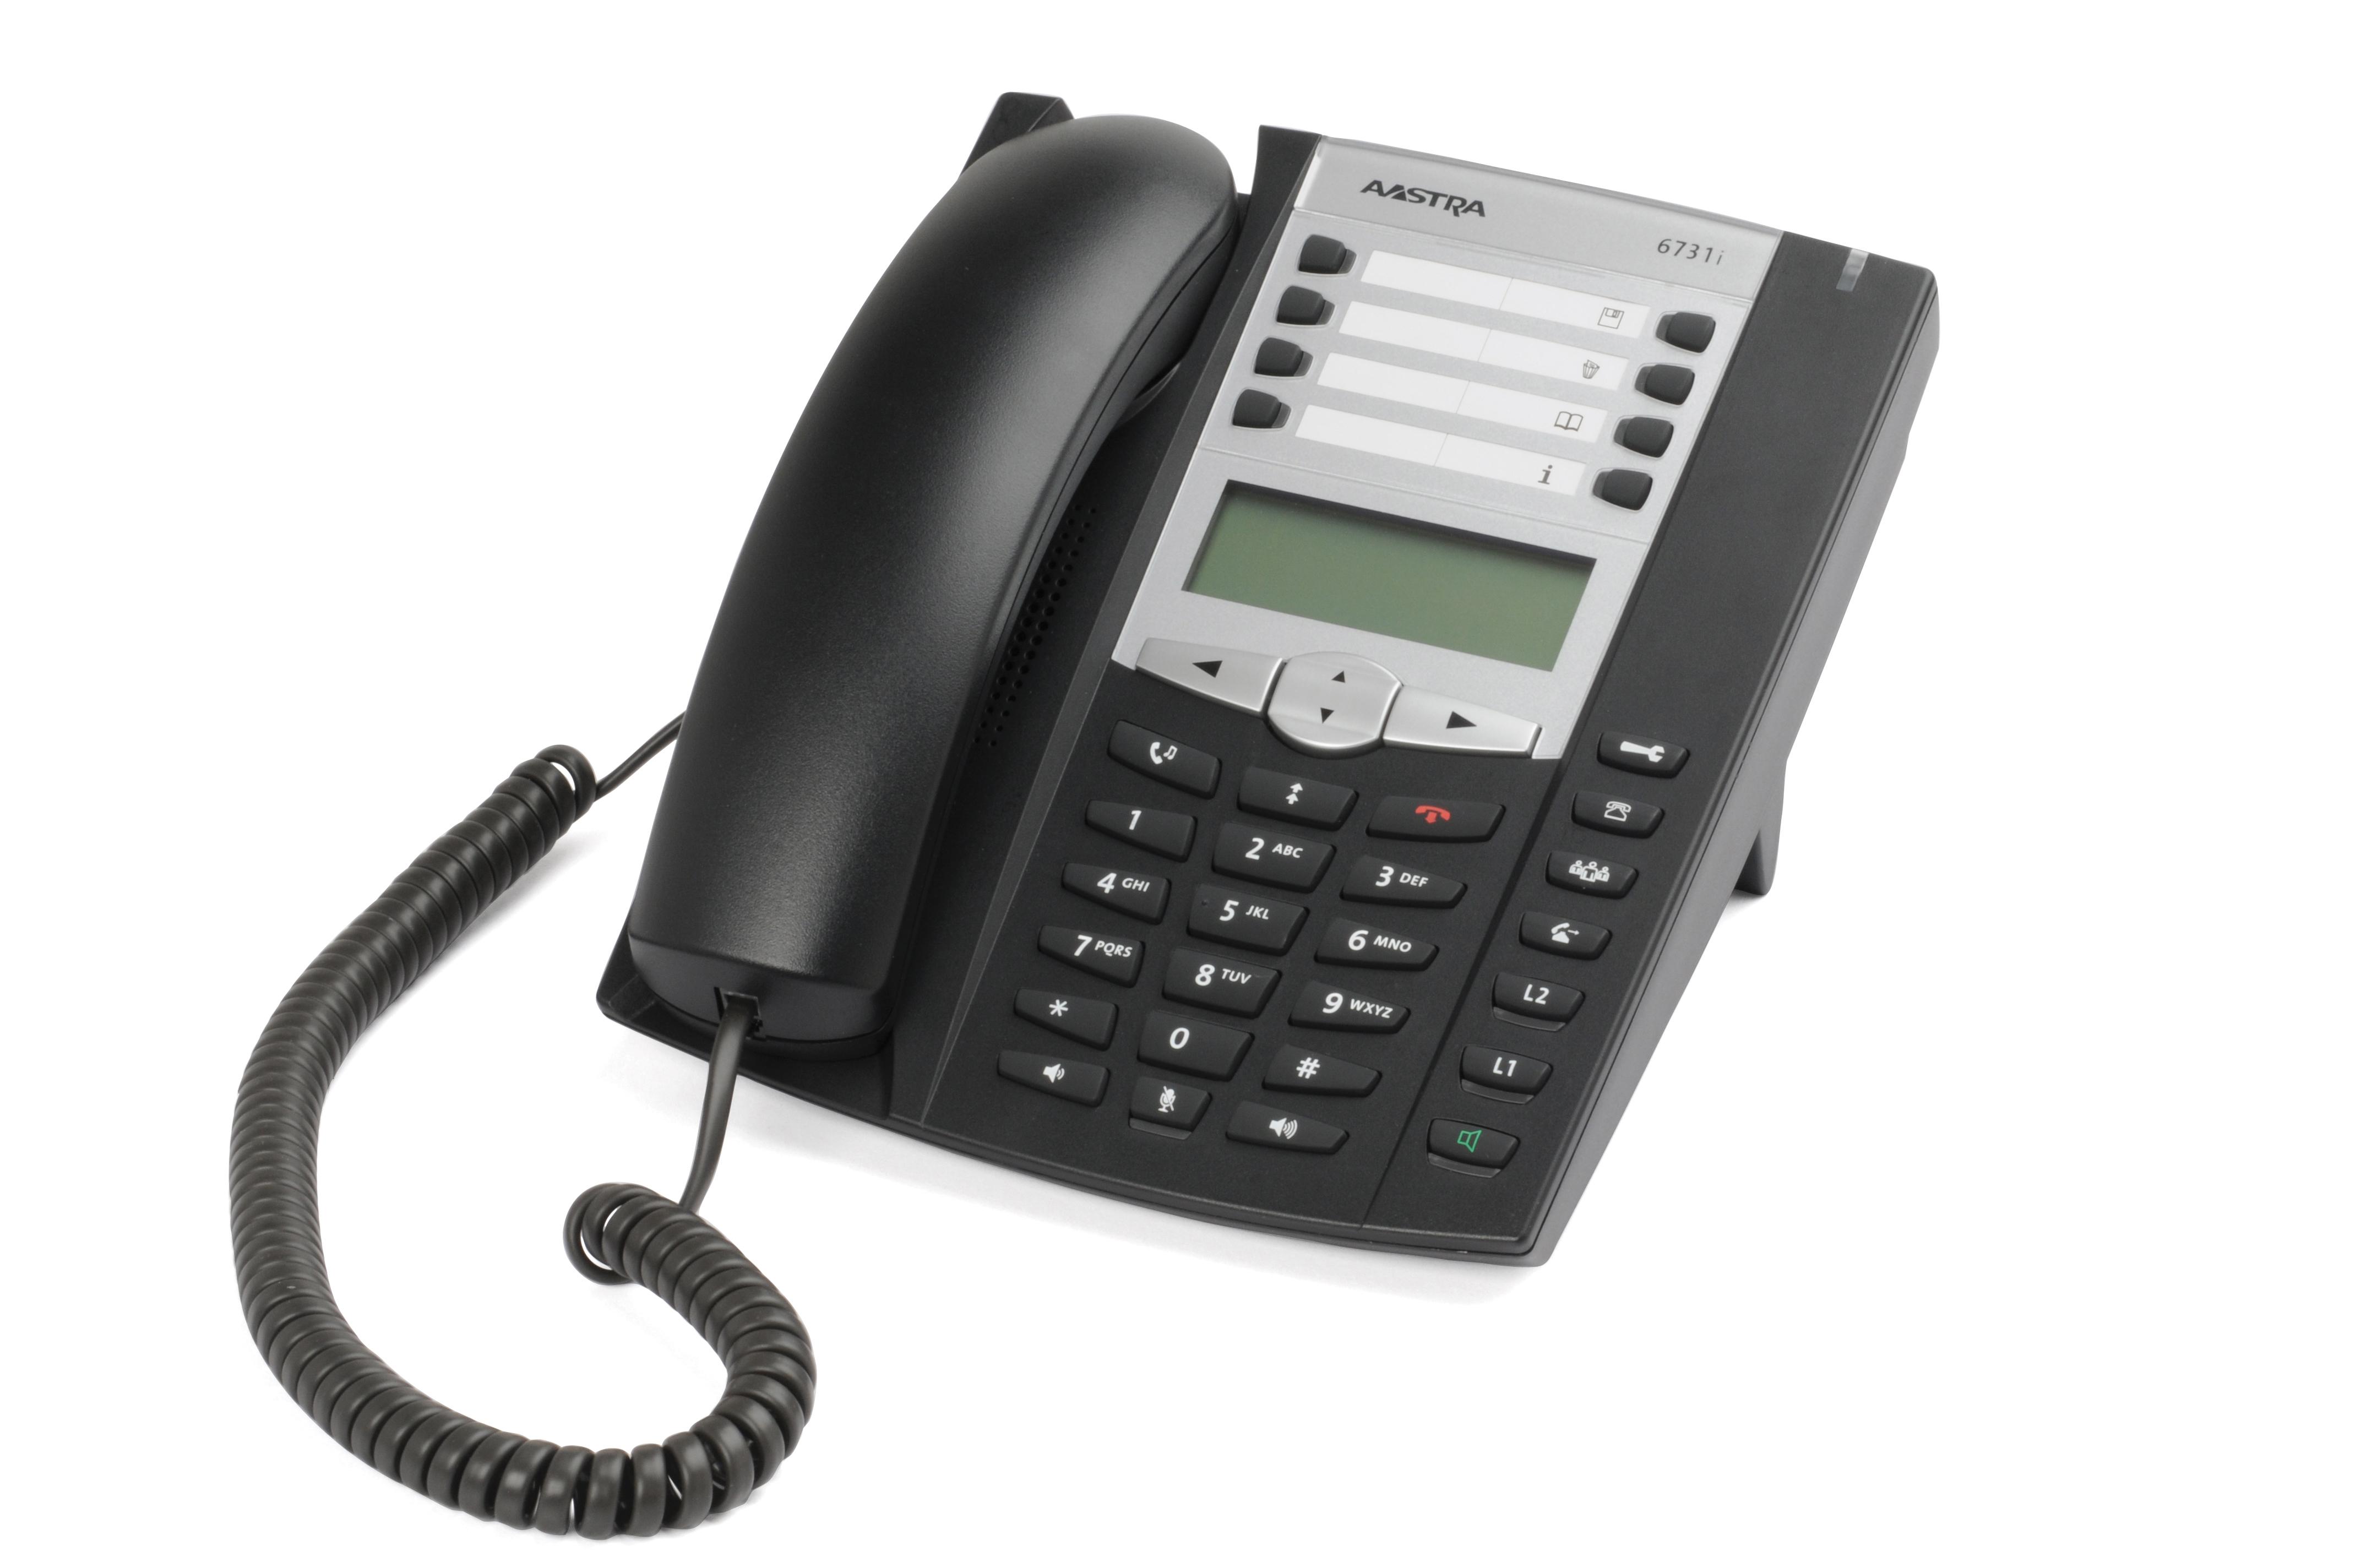 Aastra 6731i 31i Provu Communications